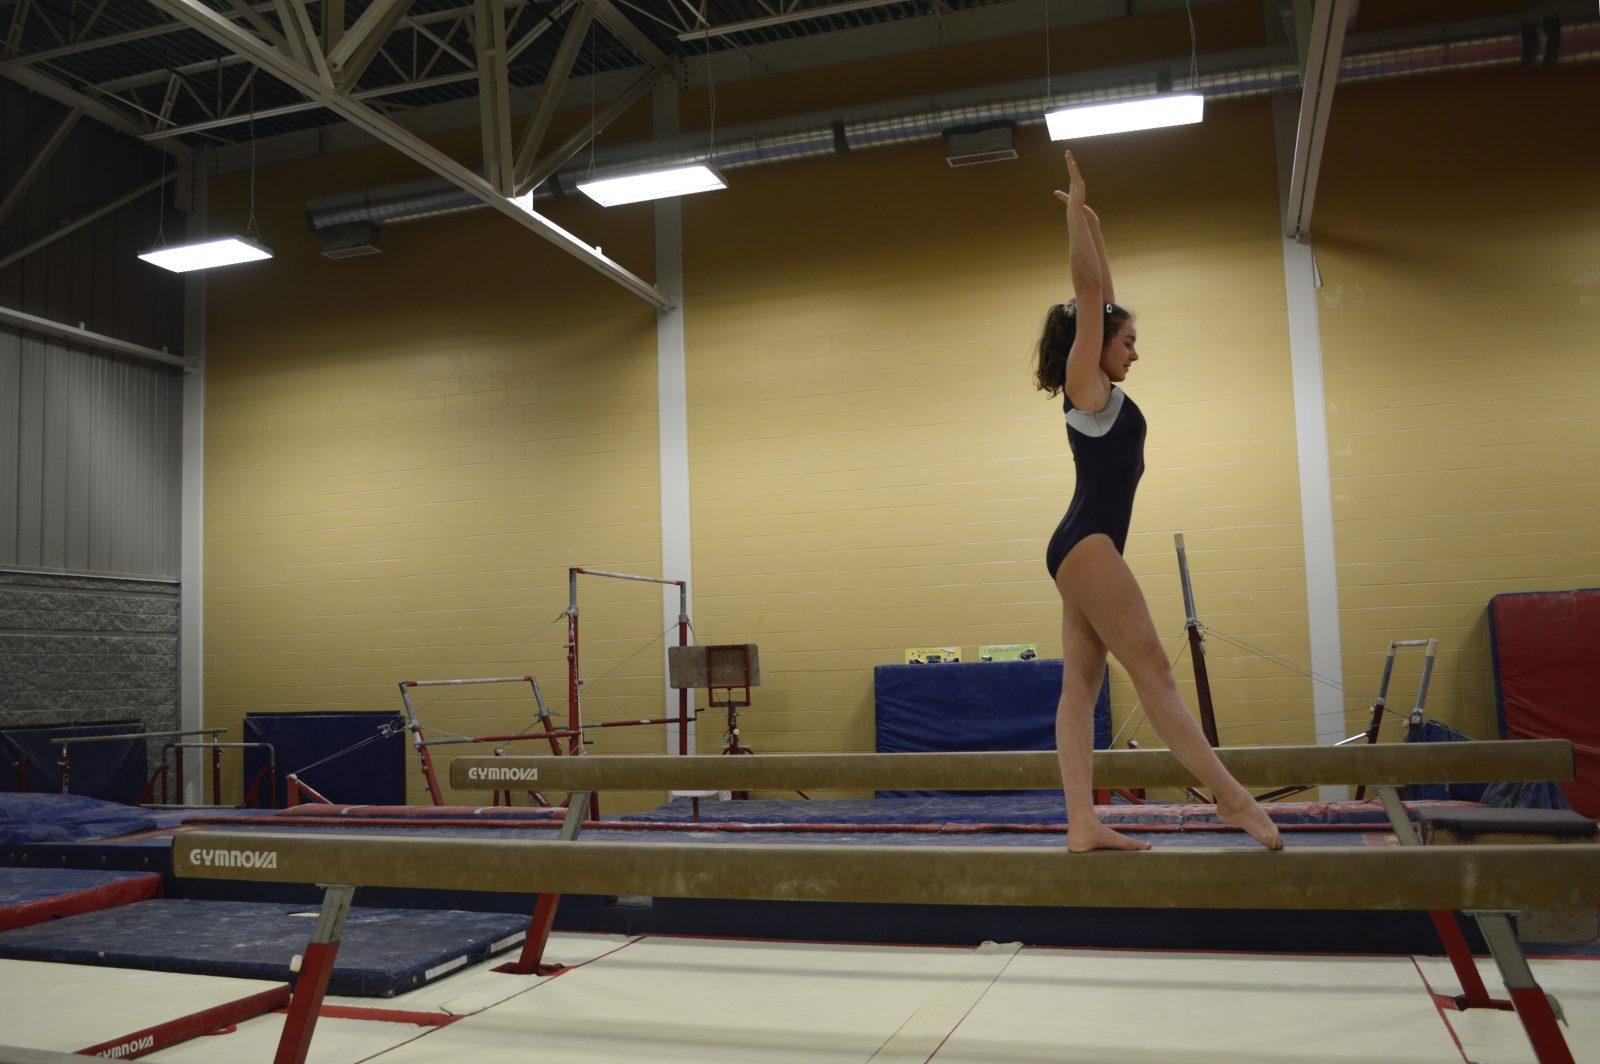 gymnastique r cr ative 6 14 ans gym trm club de gymnastique trois rivi res. Black Bedroom Furniture Sets. Home Design Ideas